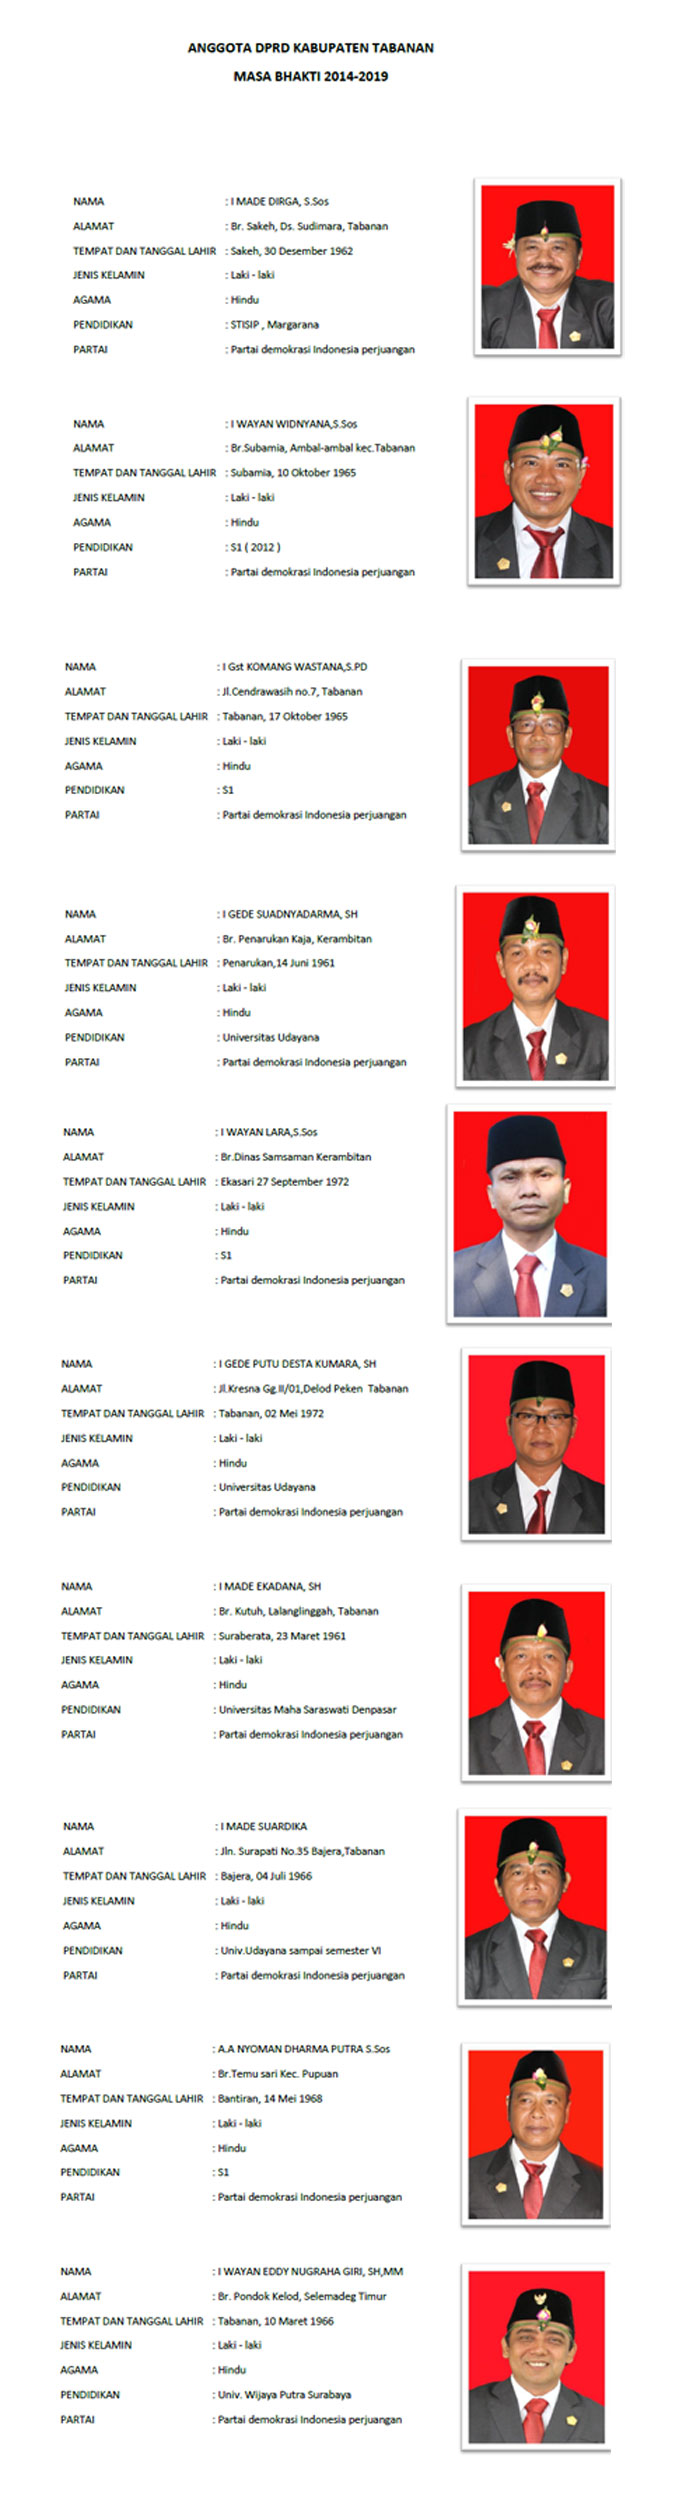 Anggota DPRD-1